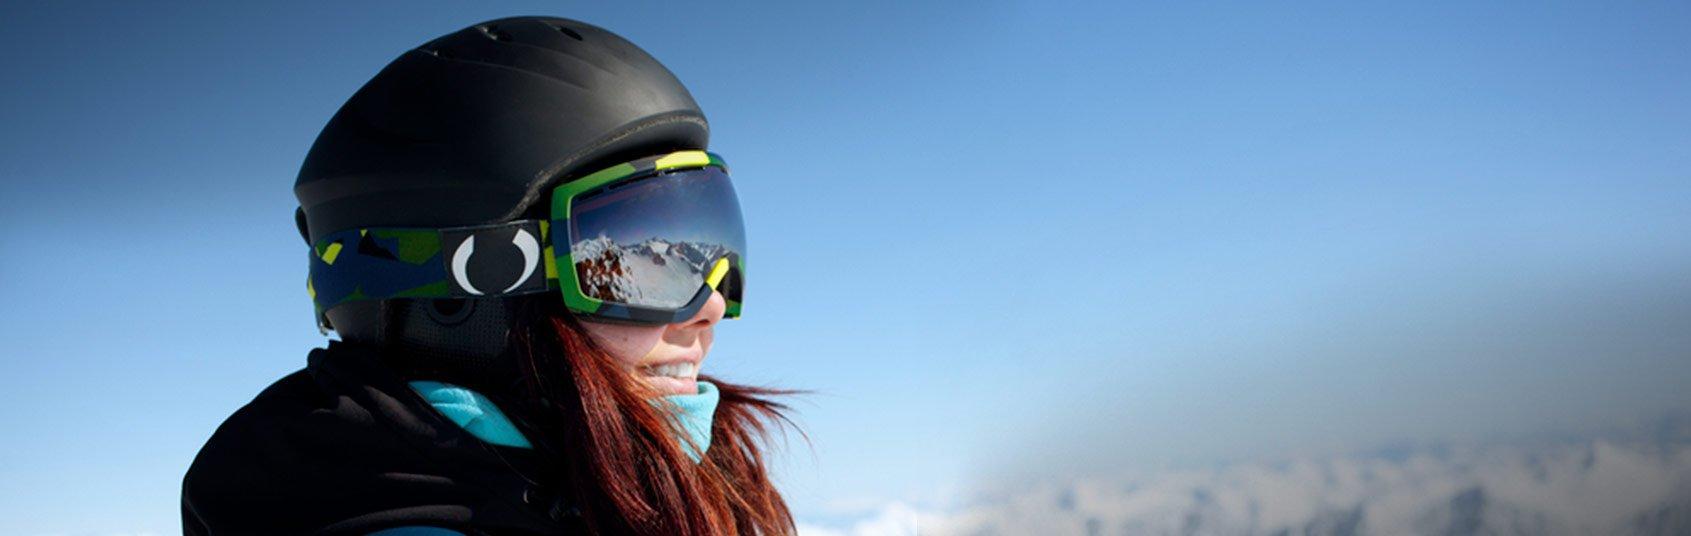 Ski Helmets | Amazon.com